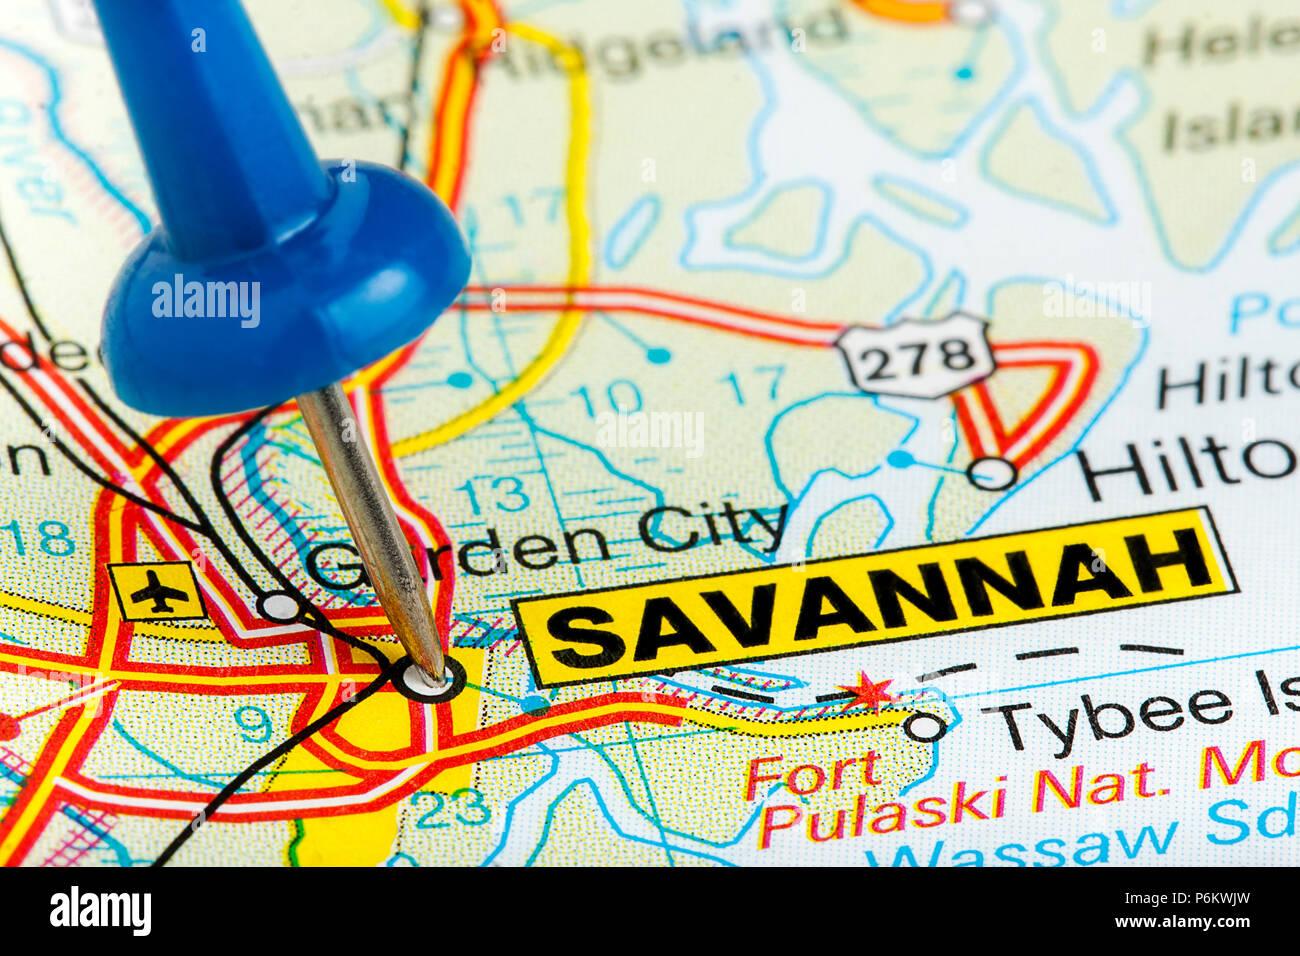 Savannah Georgia highlighted with blue push pin on atlas or ... on united states map, georgia islands map, louisville georgia map, georgia state map, geogria map, valdosta georgia map, south carolina map, milledgeville georgia map, georgia beach map, richmond hill georgia map, florida map, savannah state university, georgia road map, fulton county georgia map, new york new york map, northeast georgia map, springfield georgia map, miami map, albany georgia map, usa map,